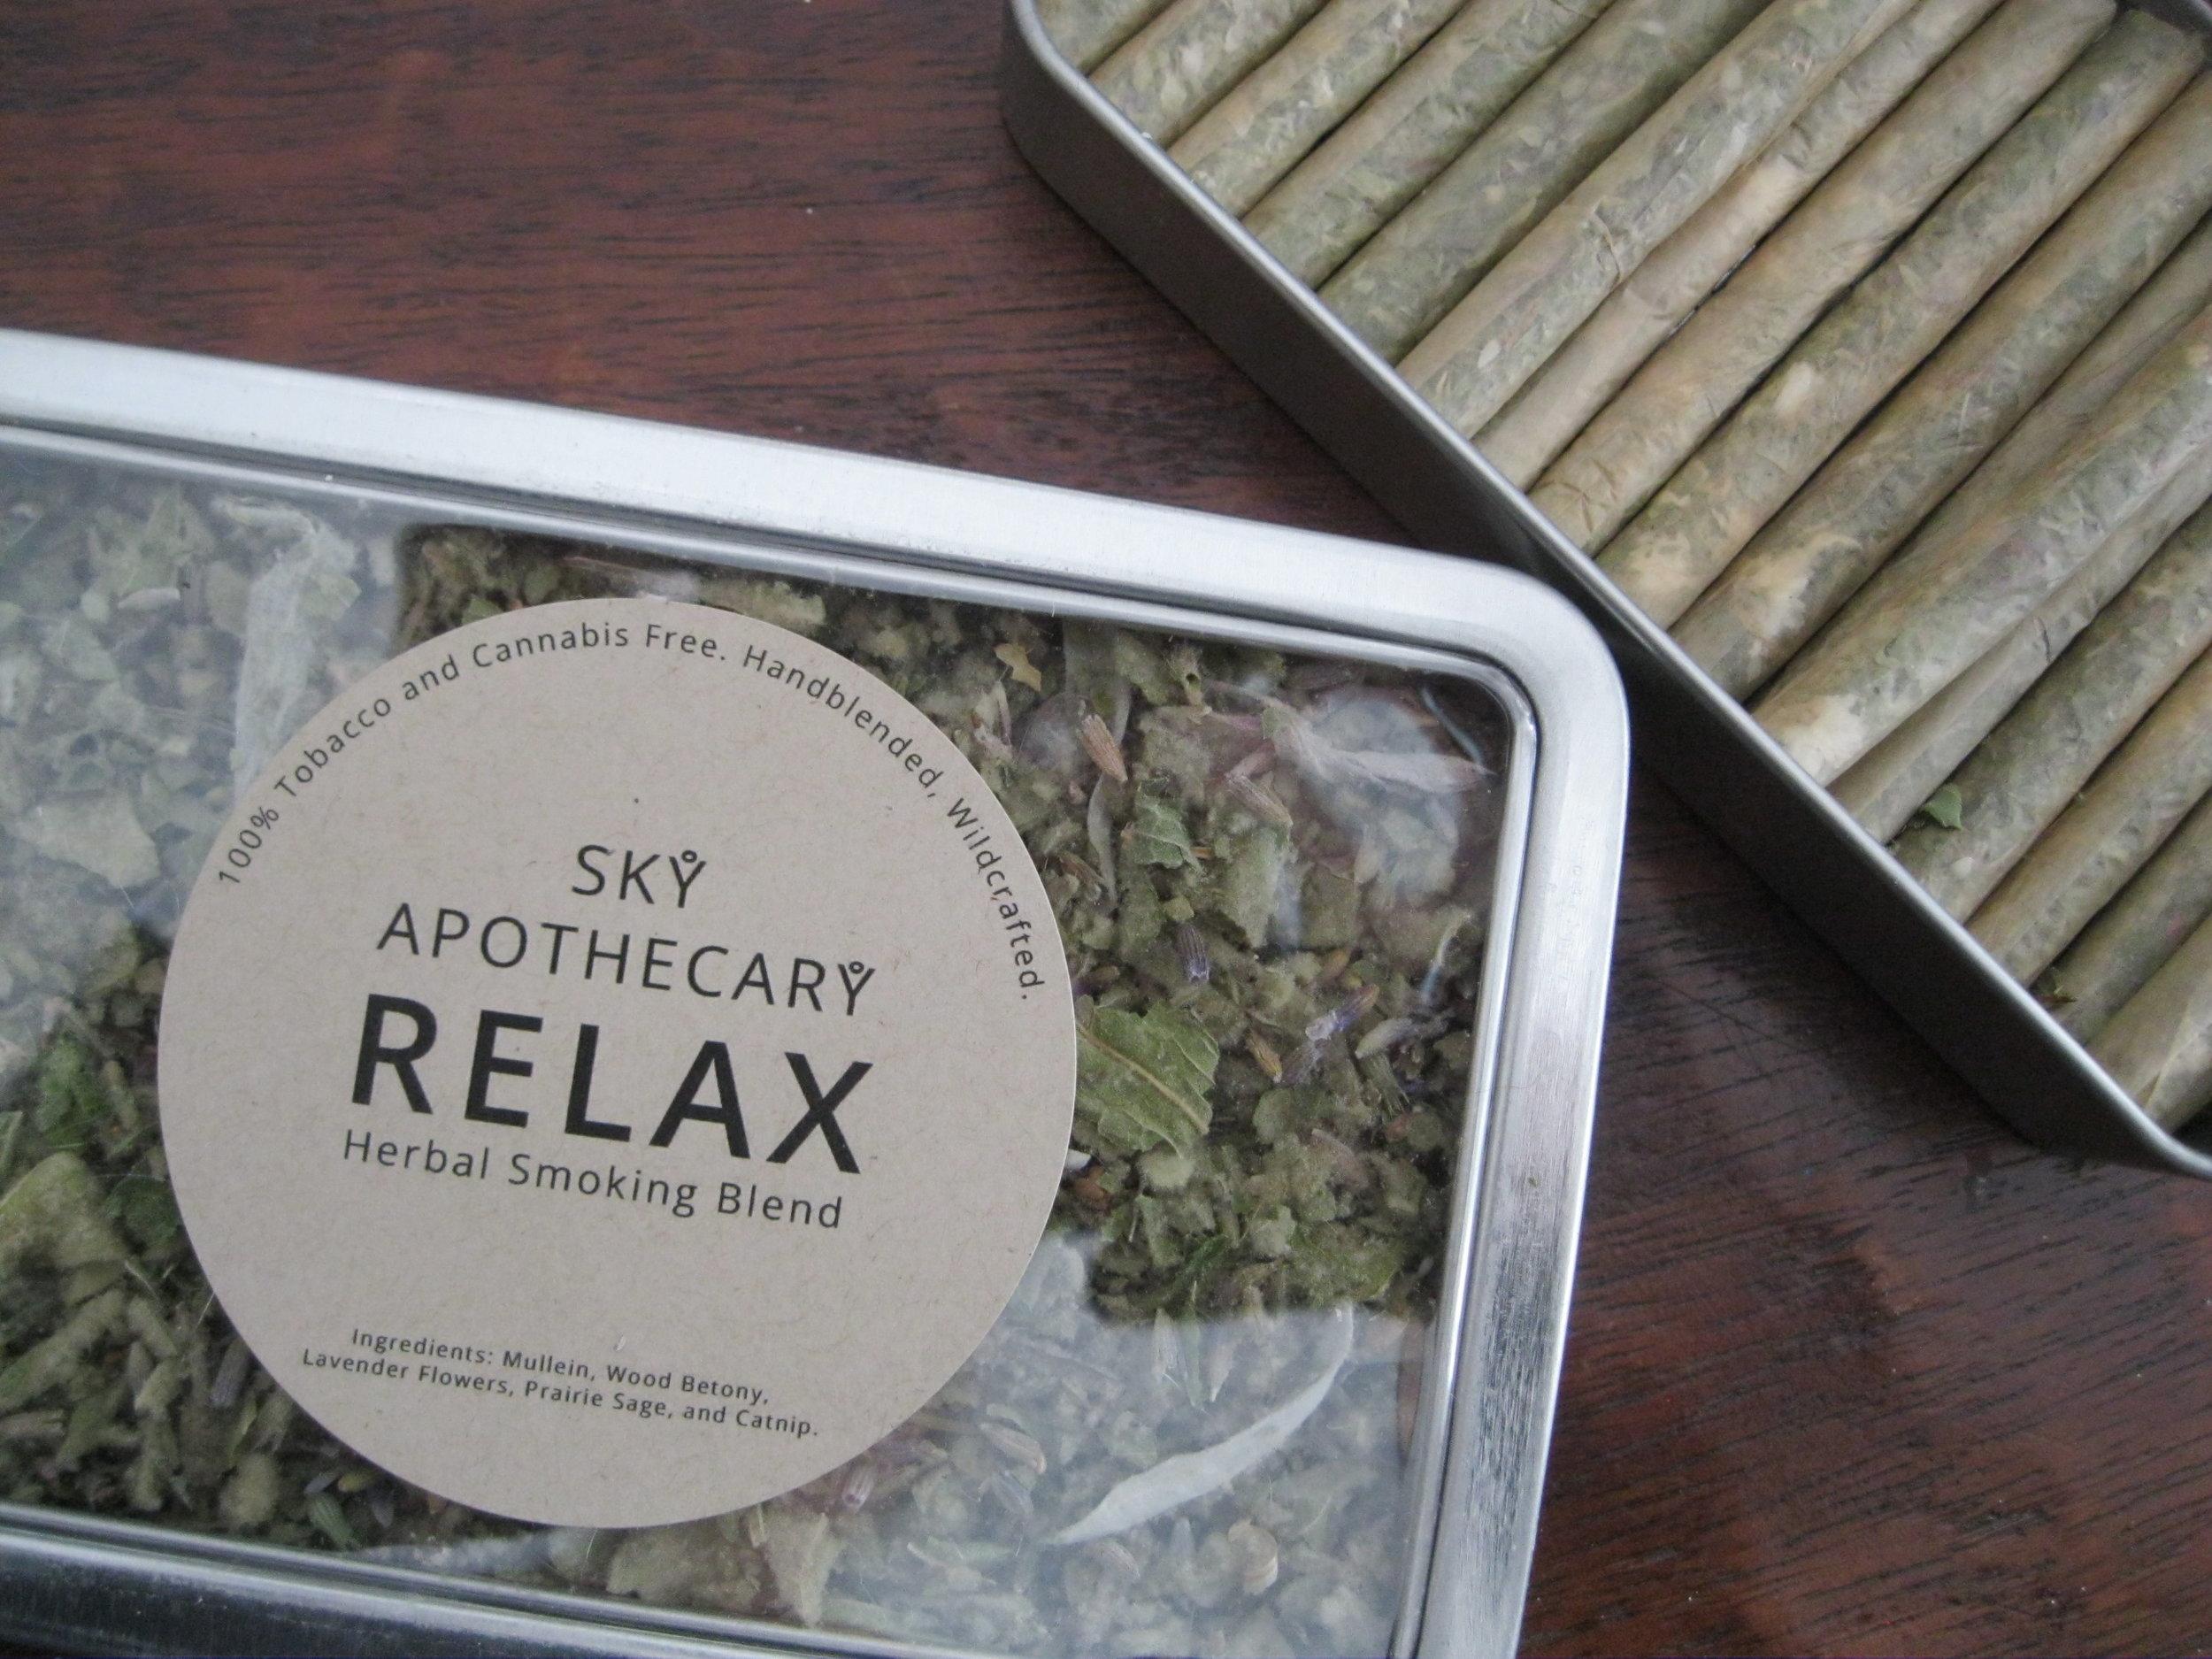 Herbal smoking blends — SKY APOTHECARY